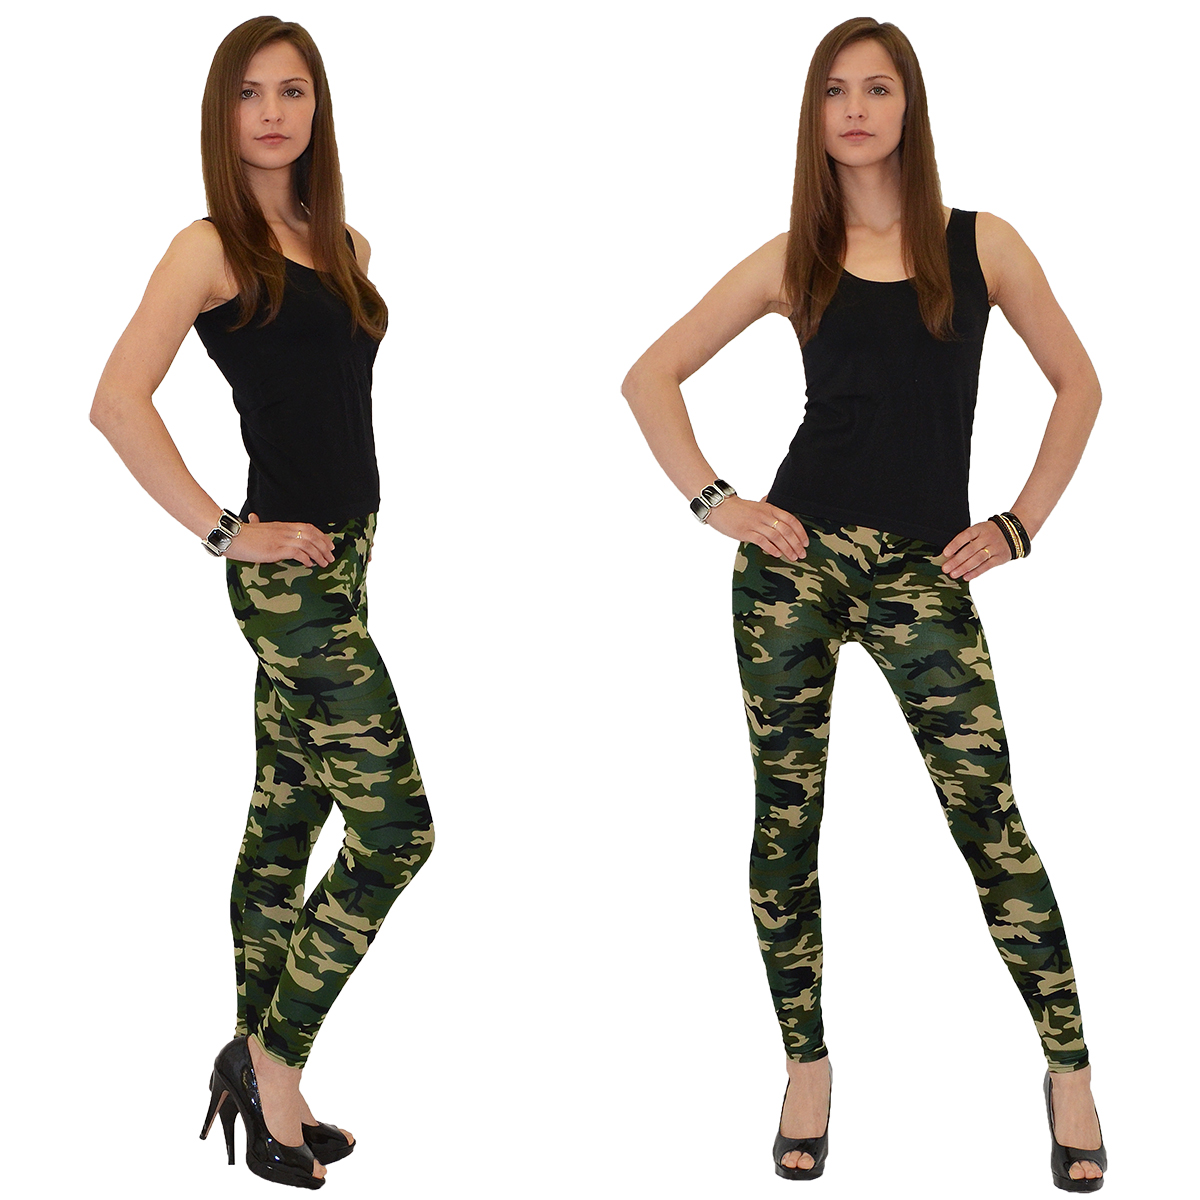 damen leggings leggins legging hose army look leging camouflage military l12 ebay. Black Bedroom Furniture Sets. Home Design Ideas